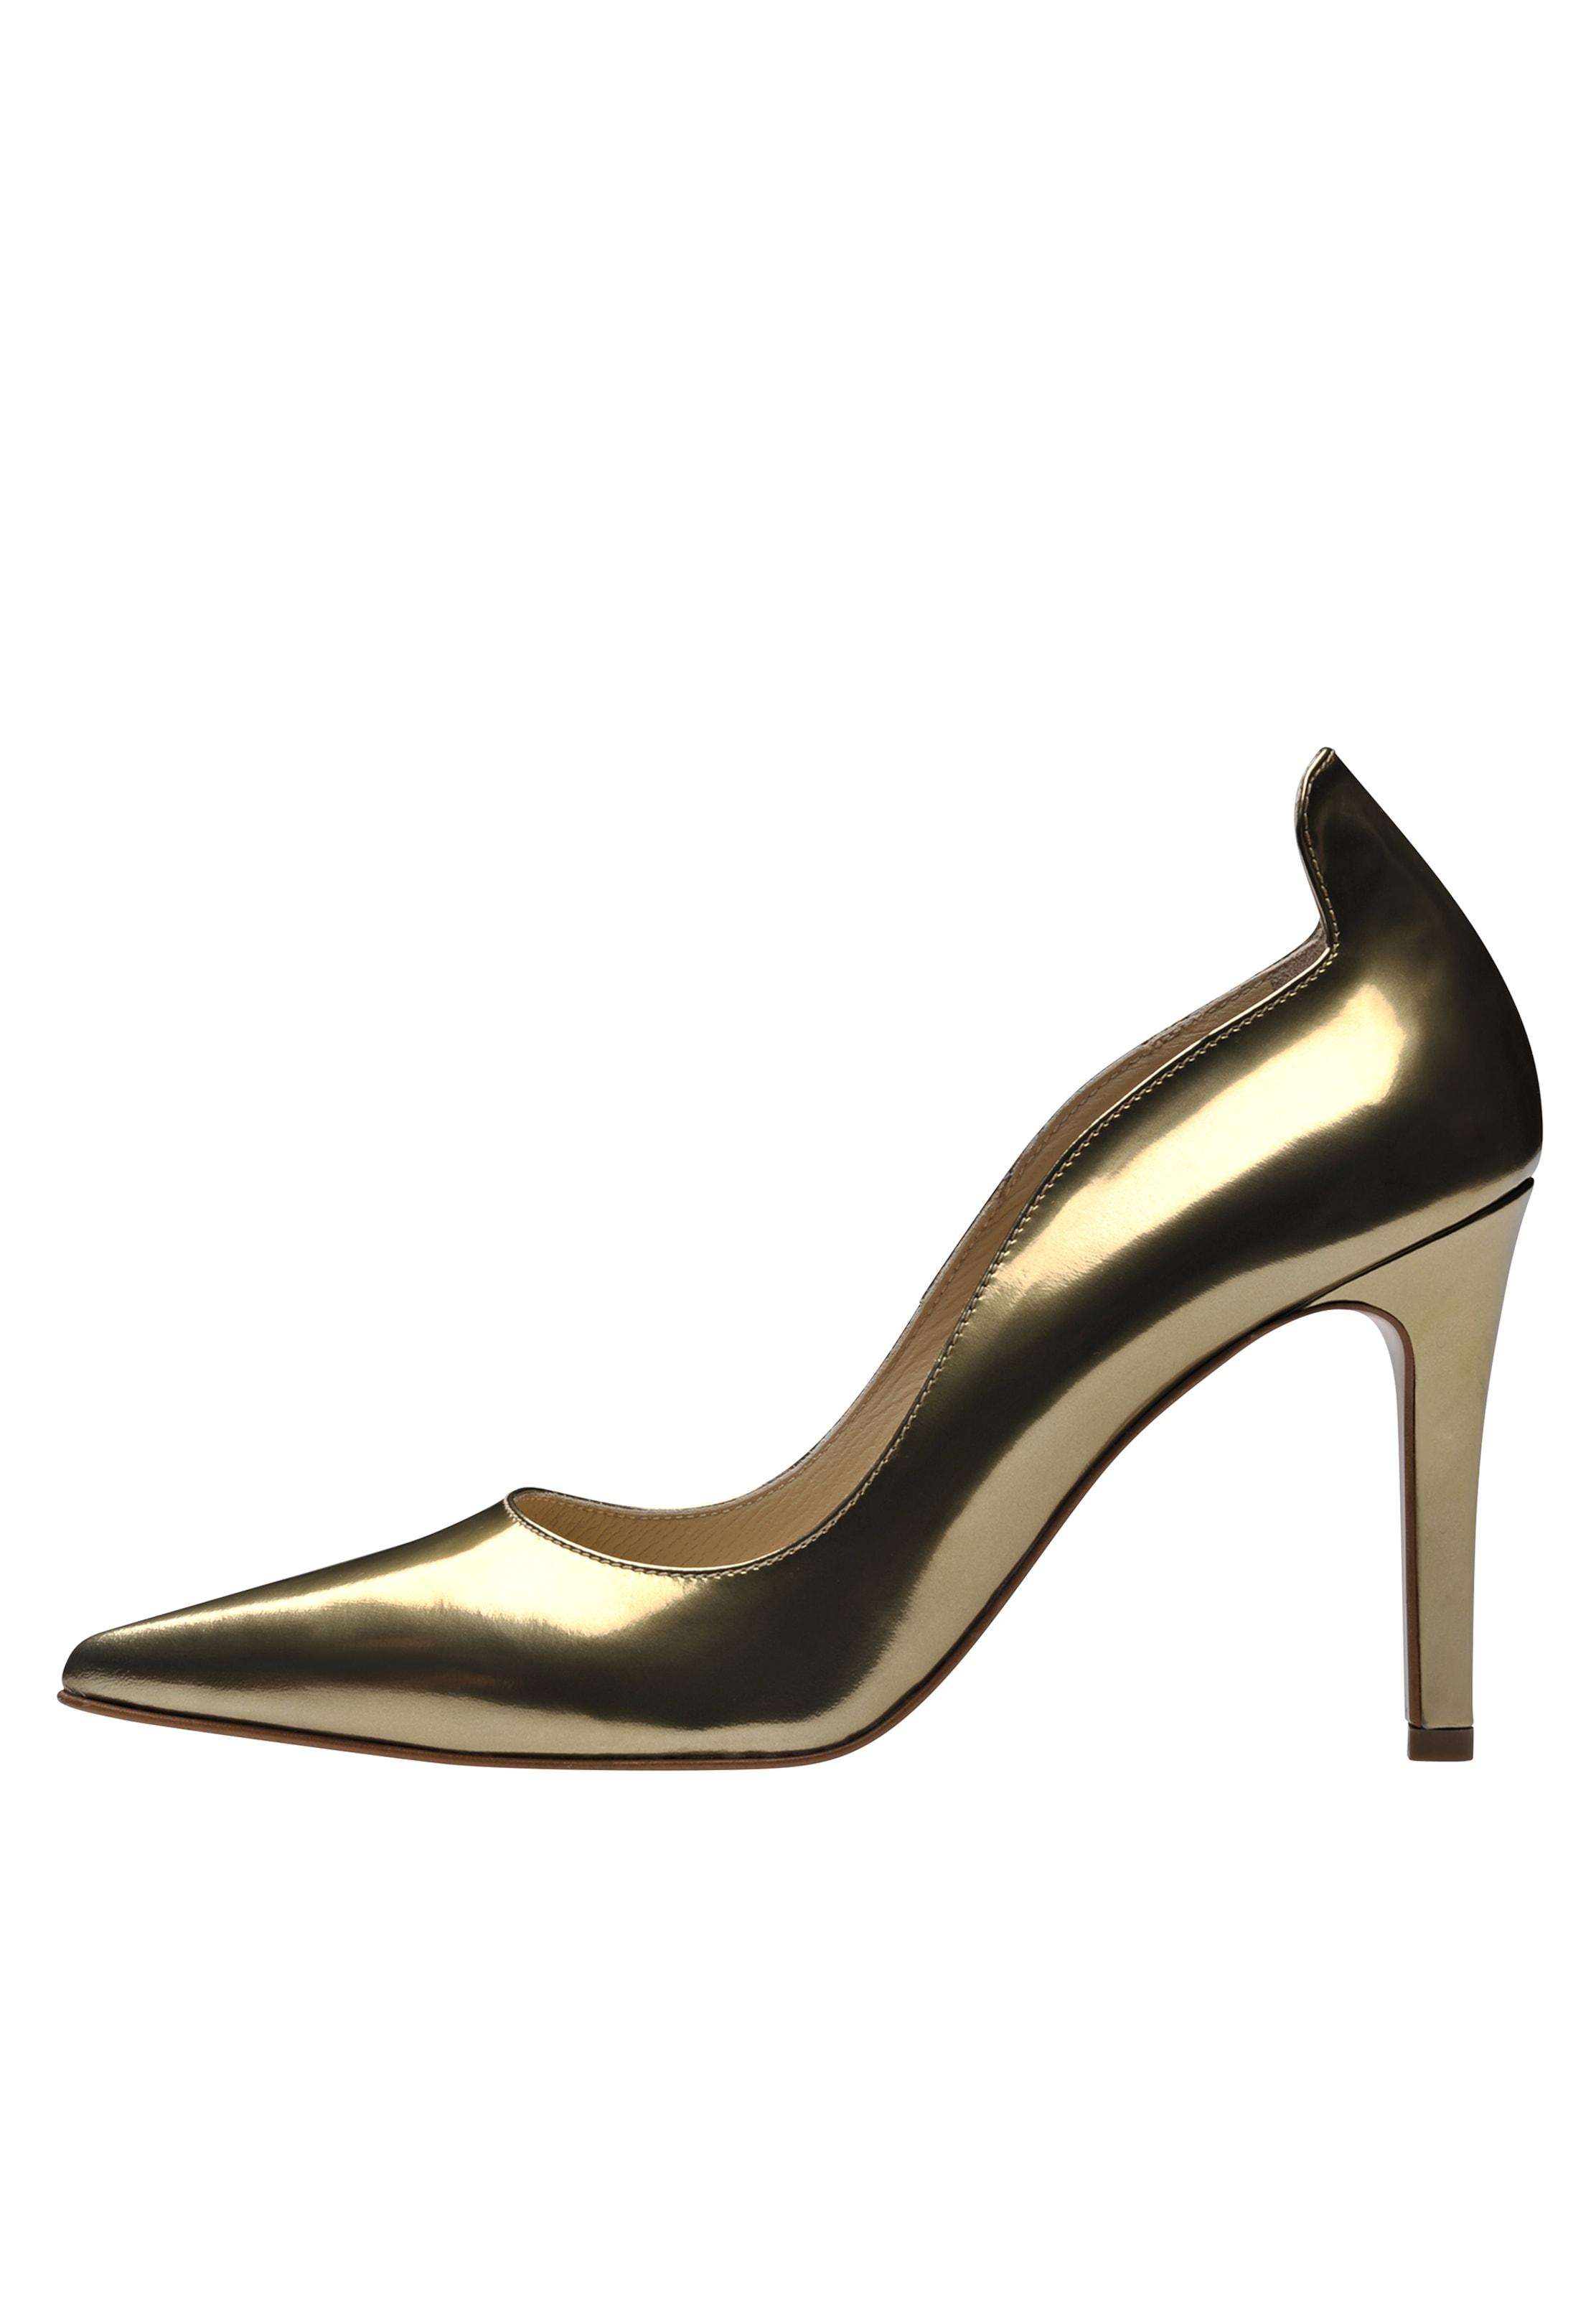 Evita In Evita Pumps Pumps In Evita Gold Gold Gold In Evita Pumps ZuTOPXilwk